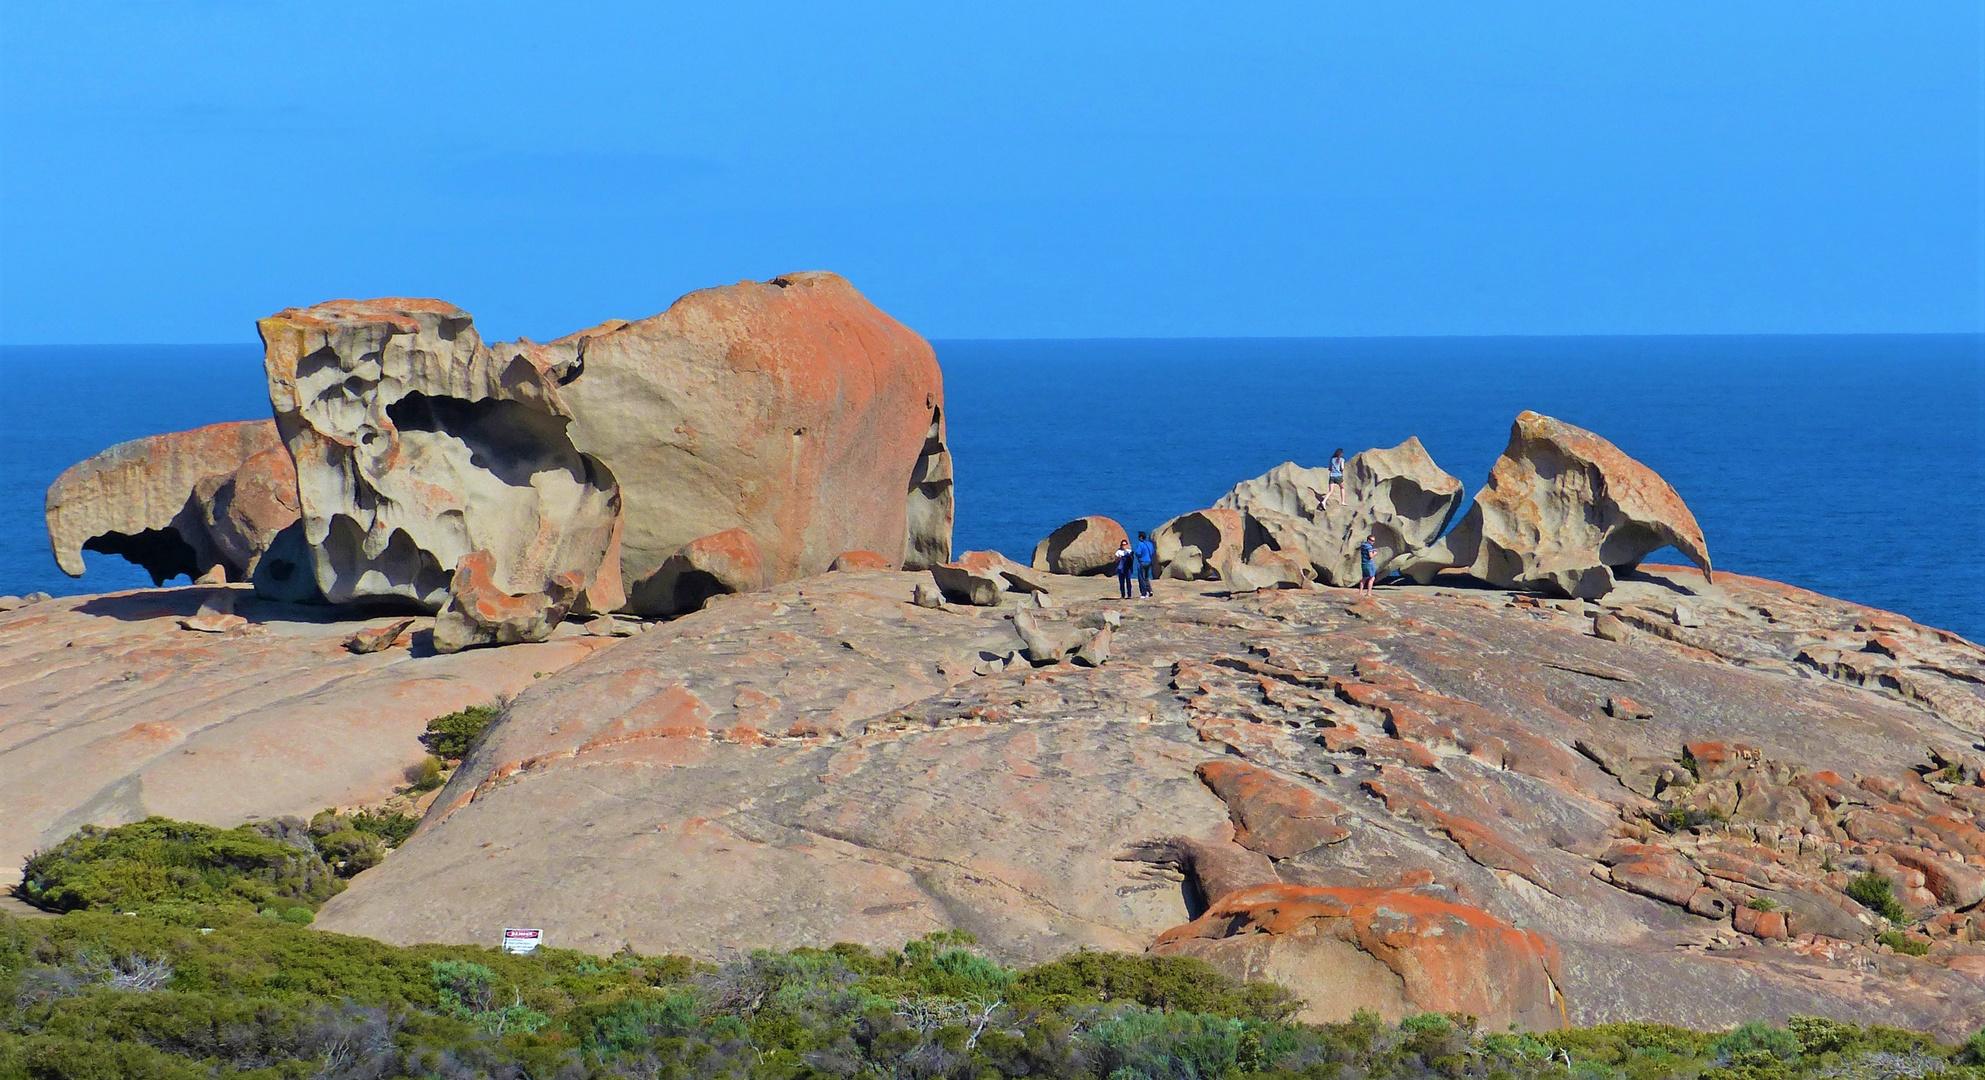 The Remarkable Rocks. Kangaroo Island, South Australia